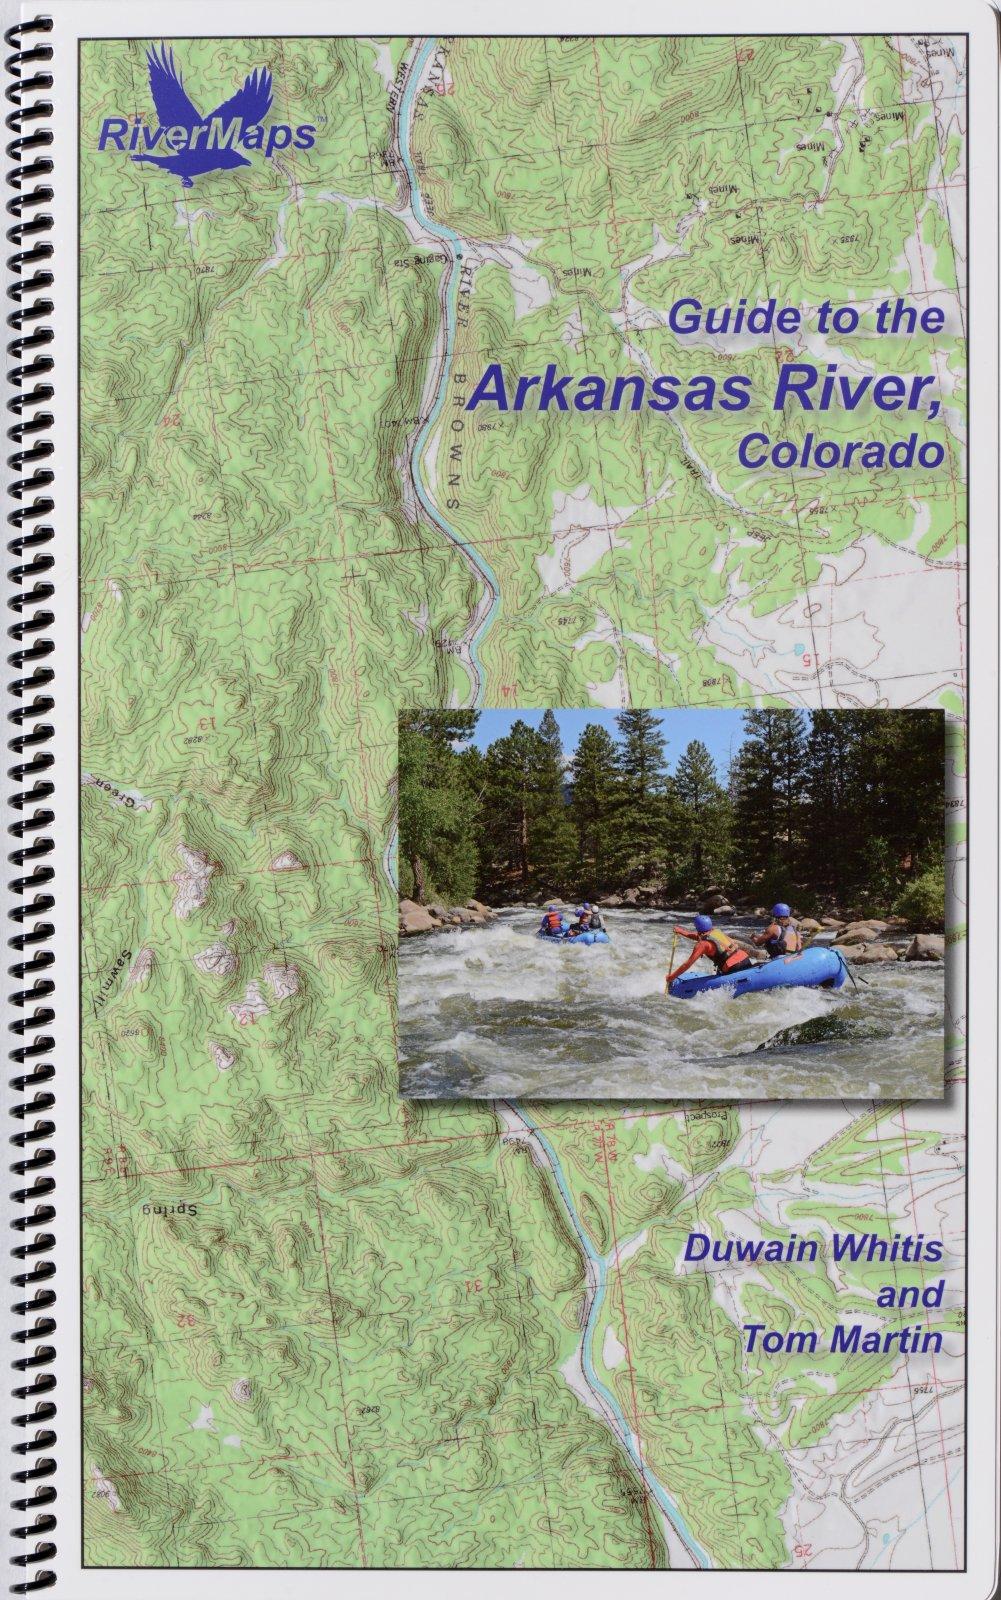 RiverMaps Guide to the Arkansas River, Colorado